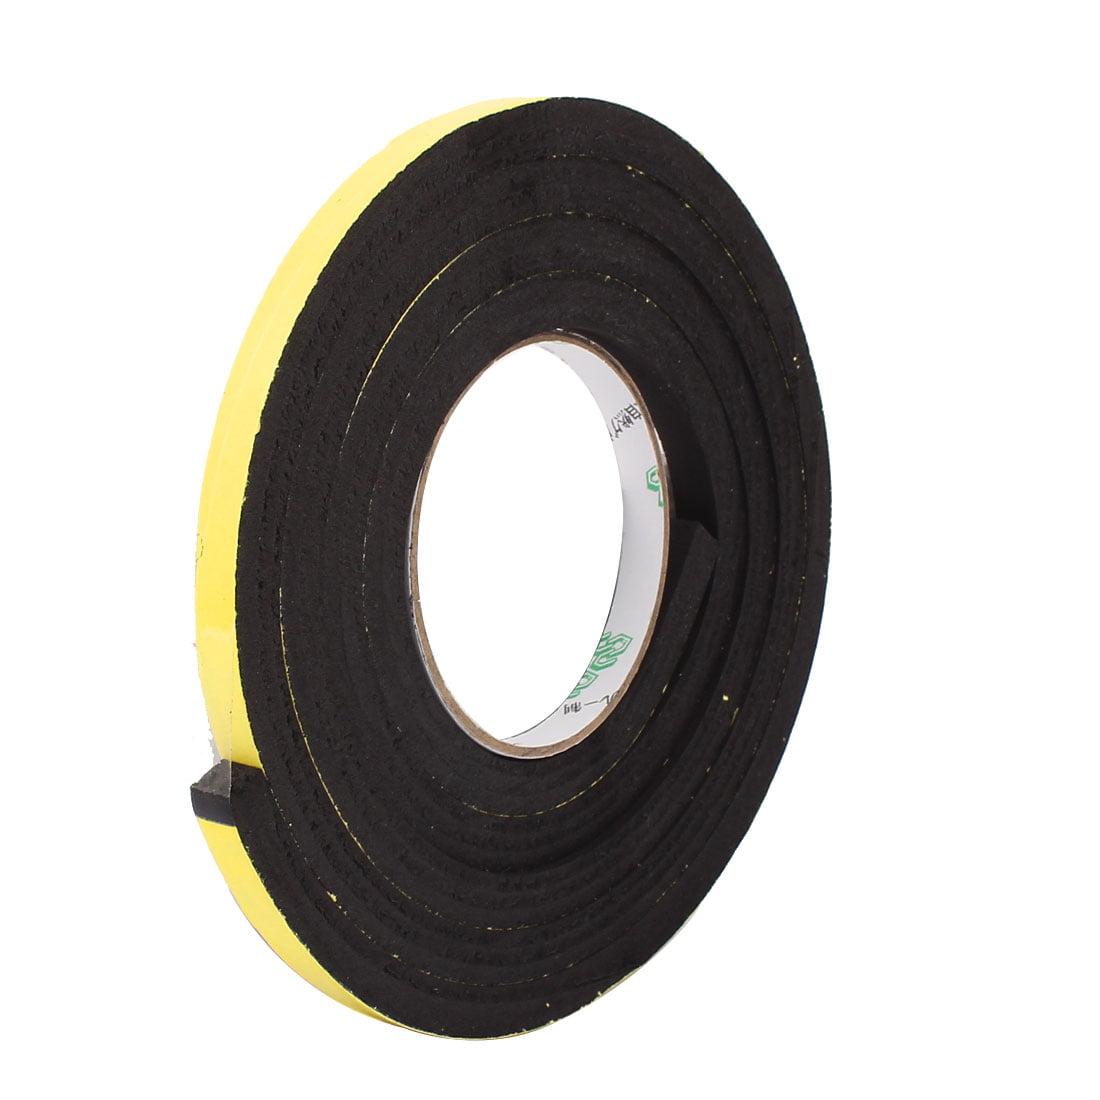 10x10mm Single Sided Self-Adhesive Shockproof Sponge Foam Tape 2M Long